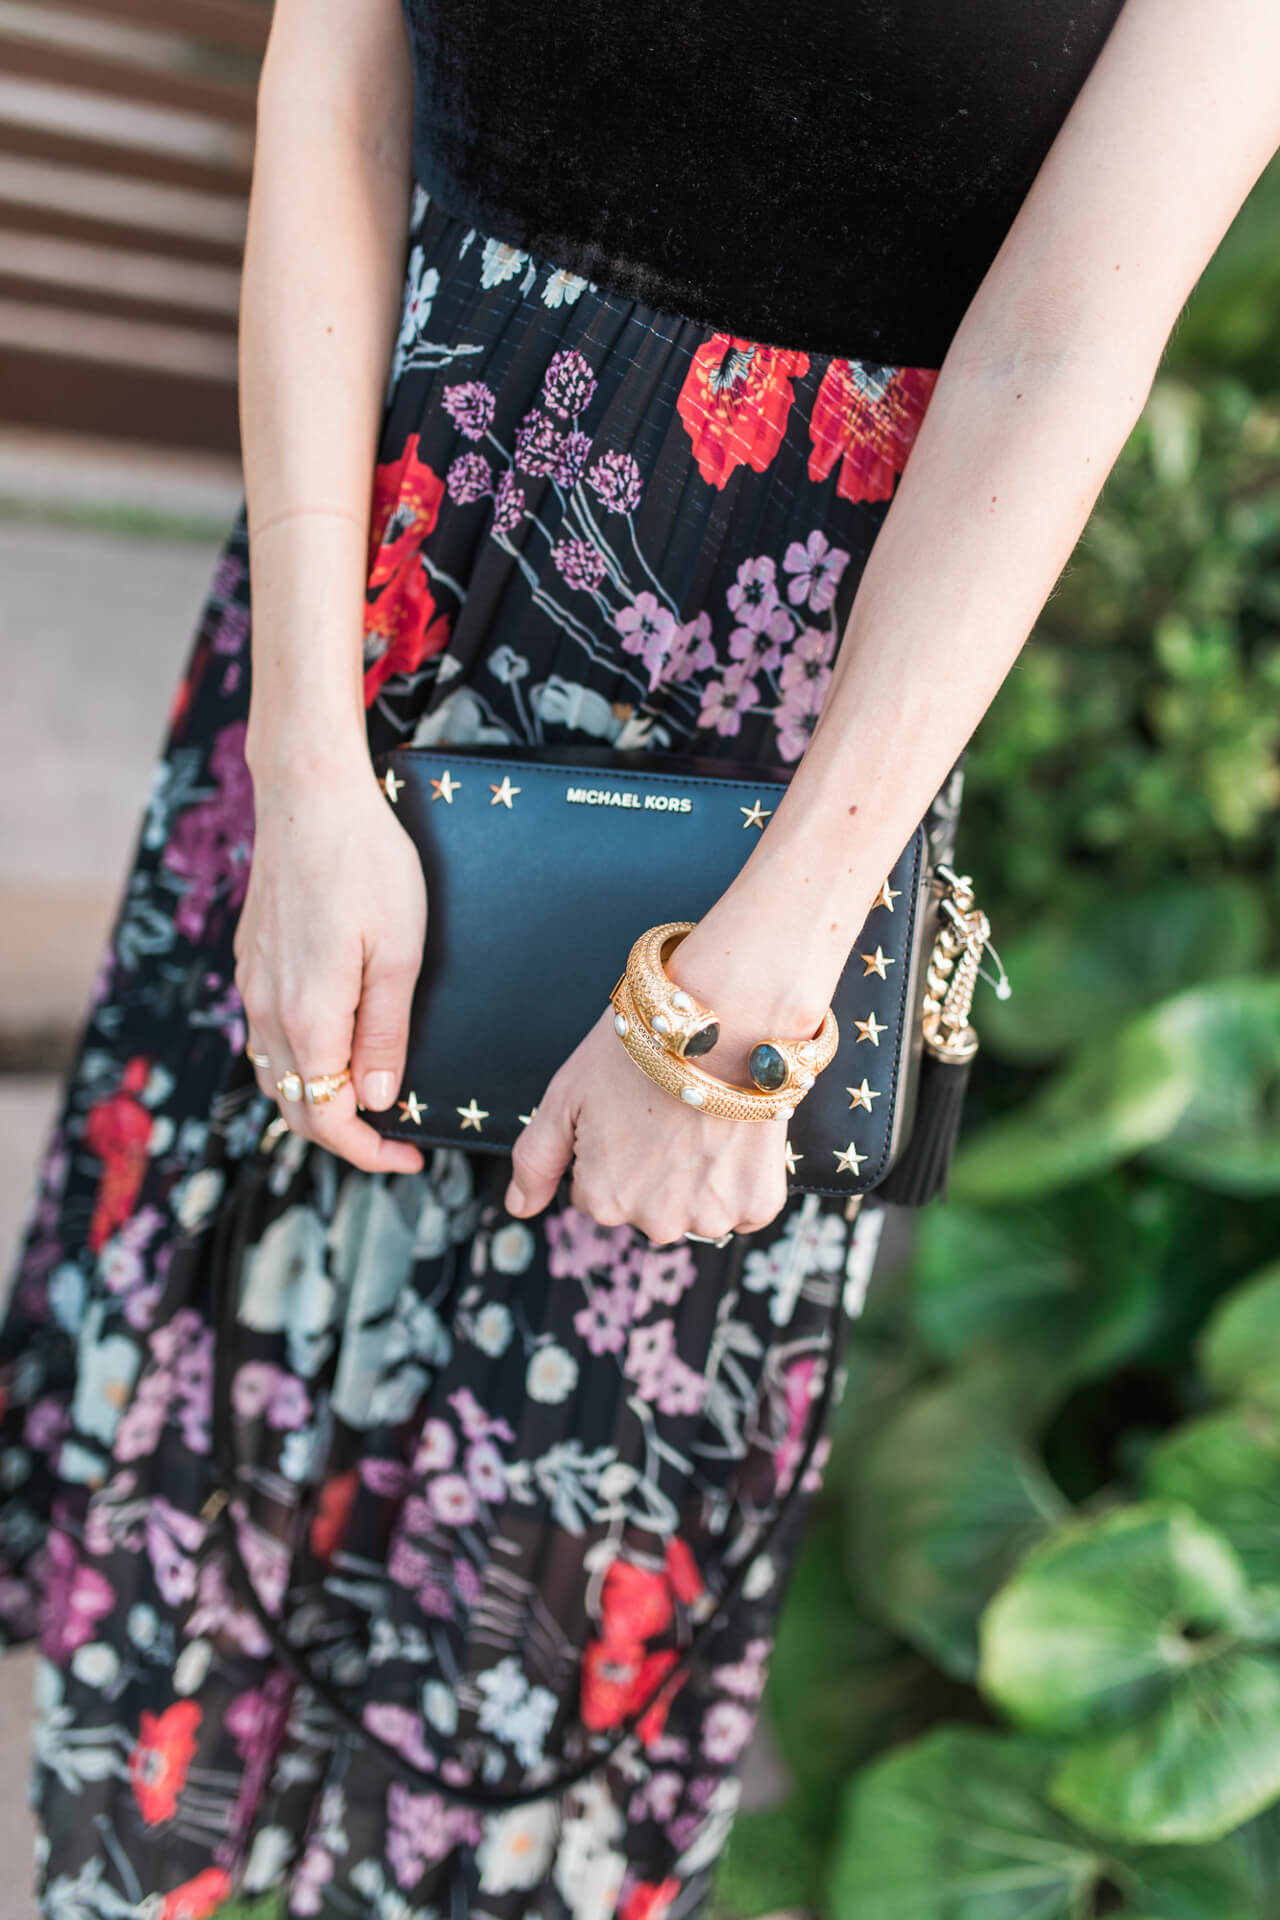 Cute michael kors crossbody with floral skirt